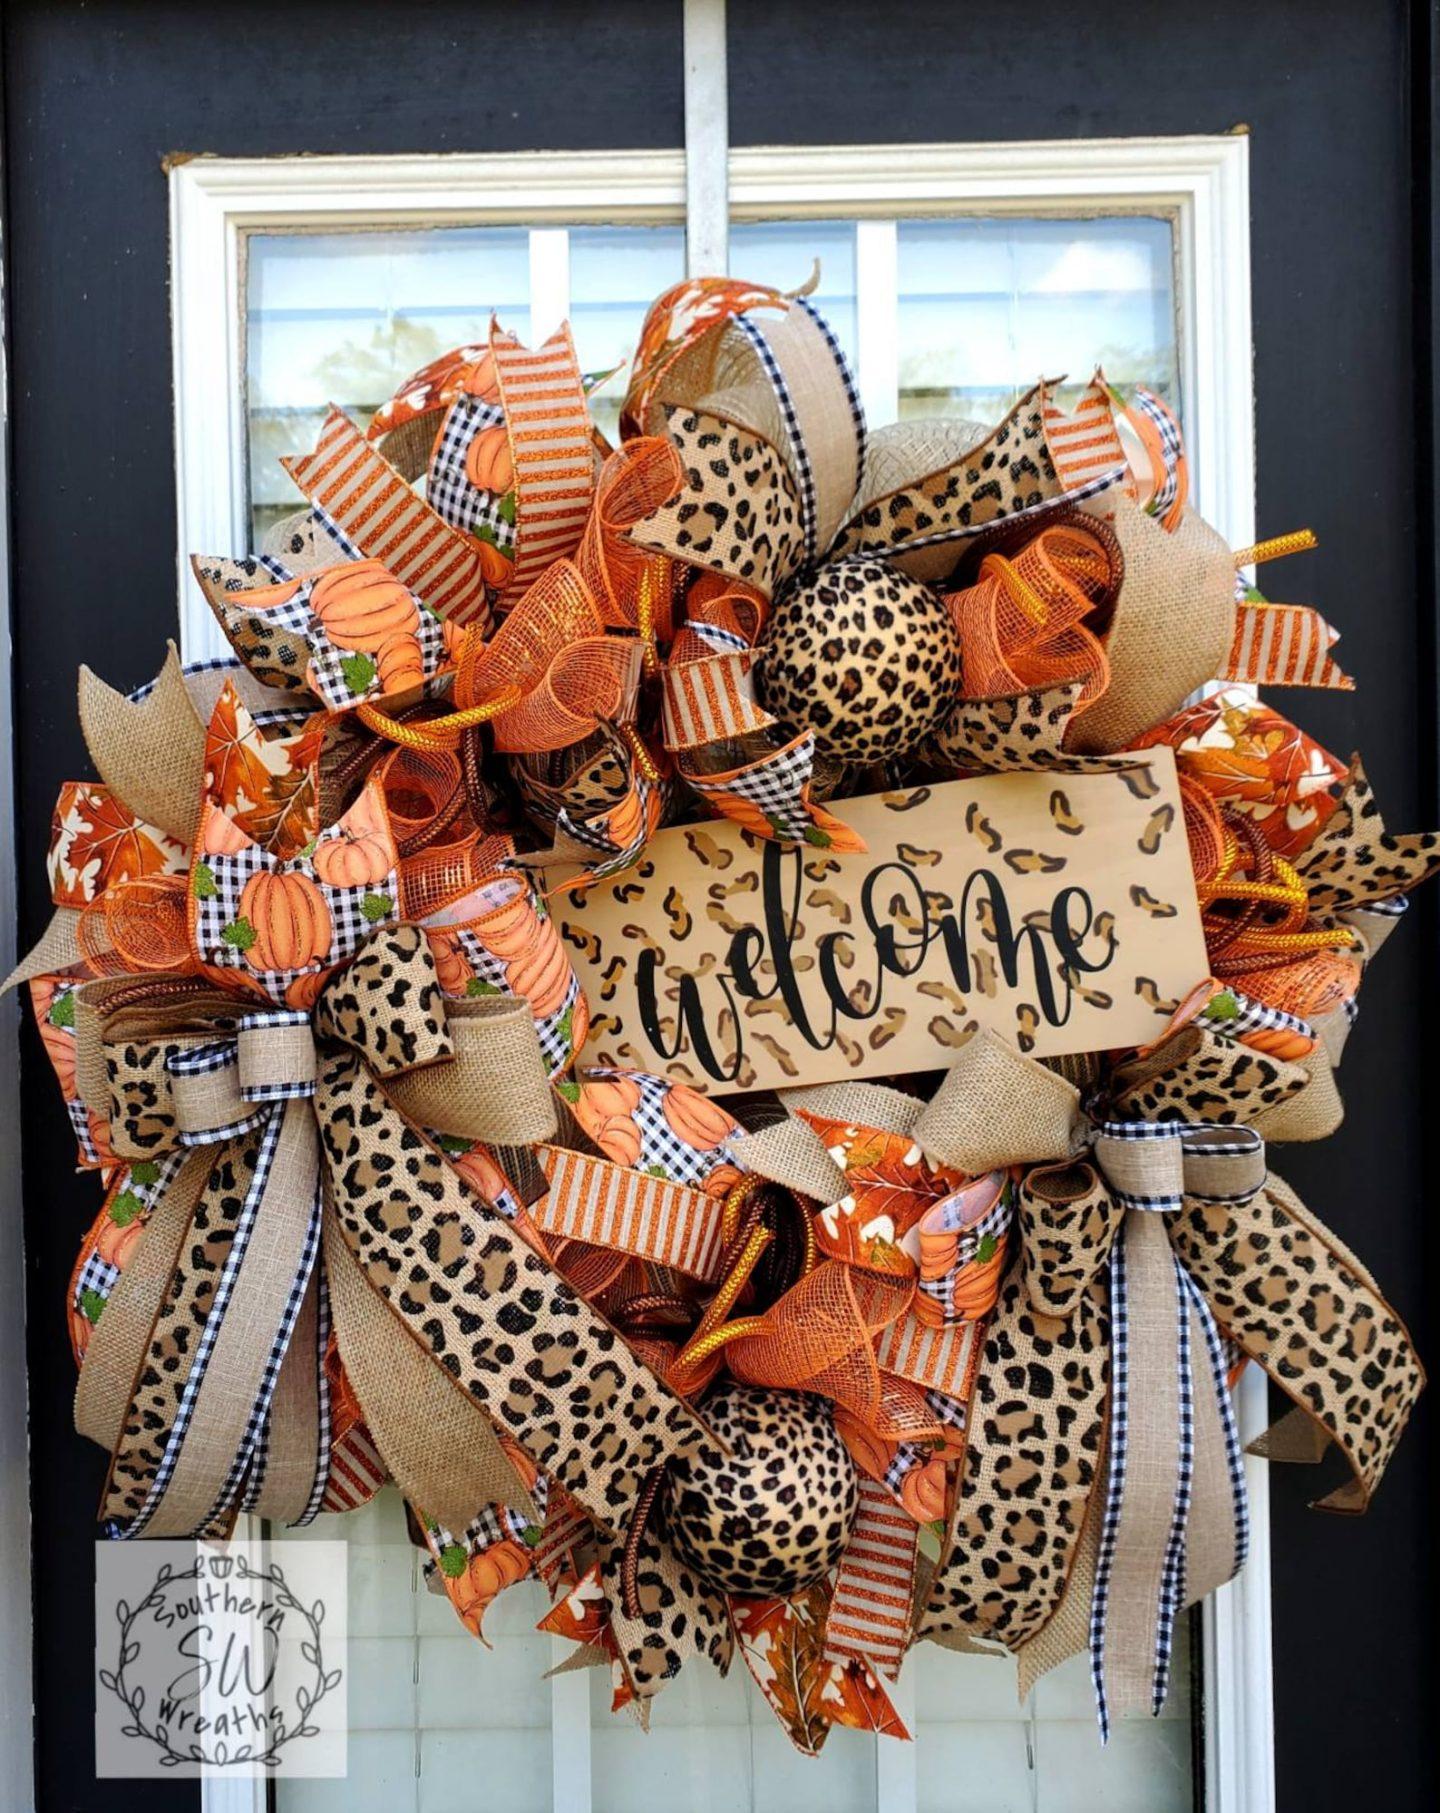 Leopard print deco mesh wreath with burlap